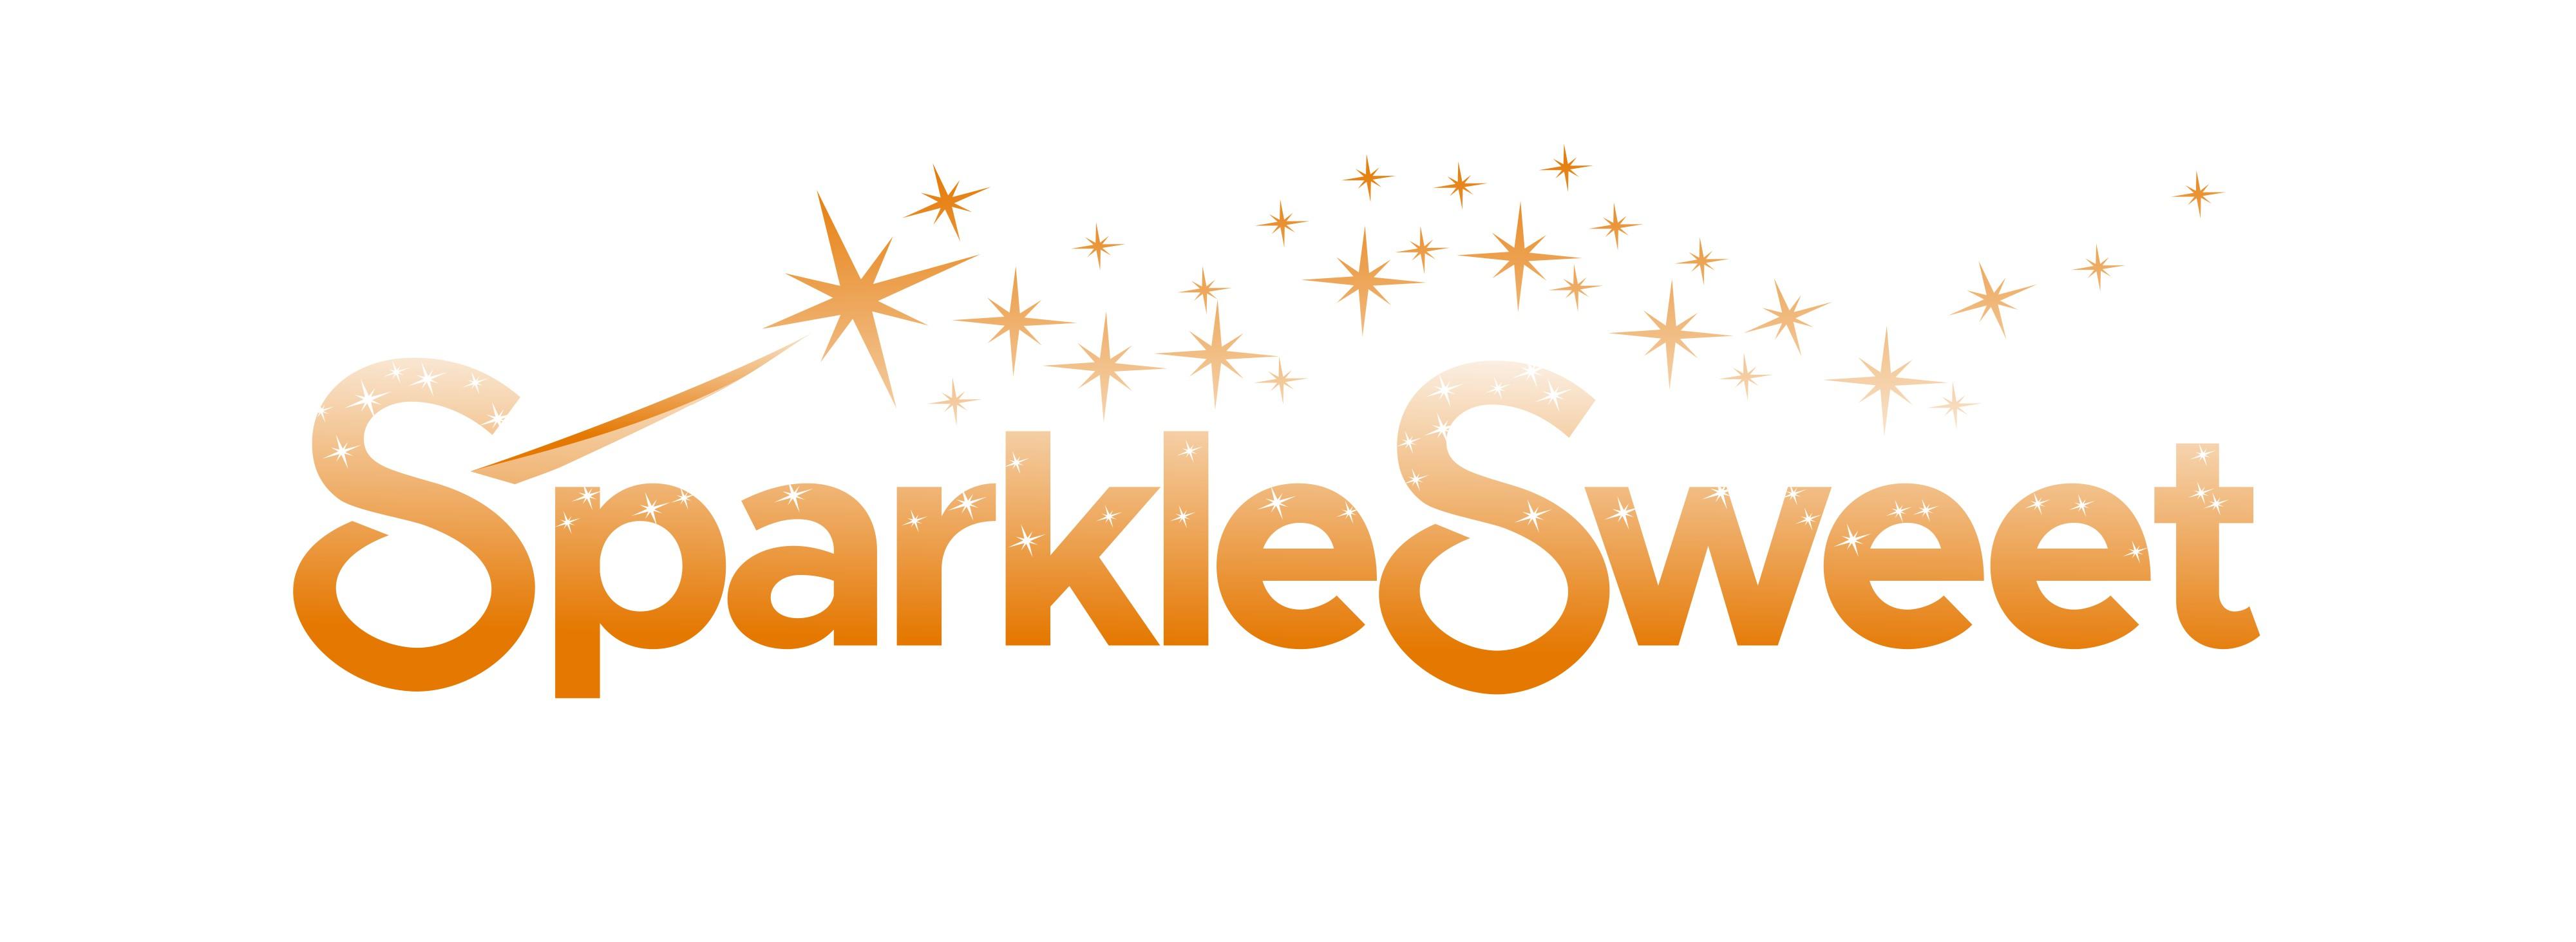 Make SparkleSweet Sparkle with your creative genius